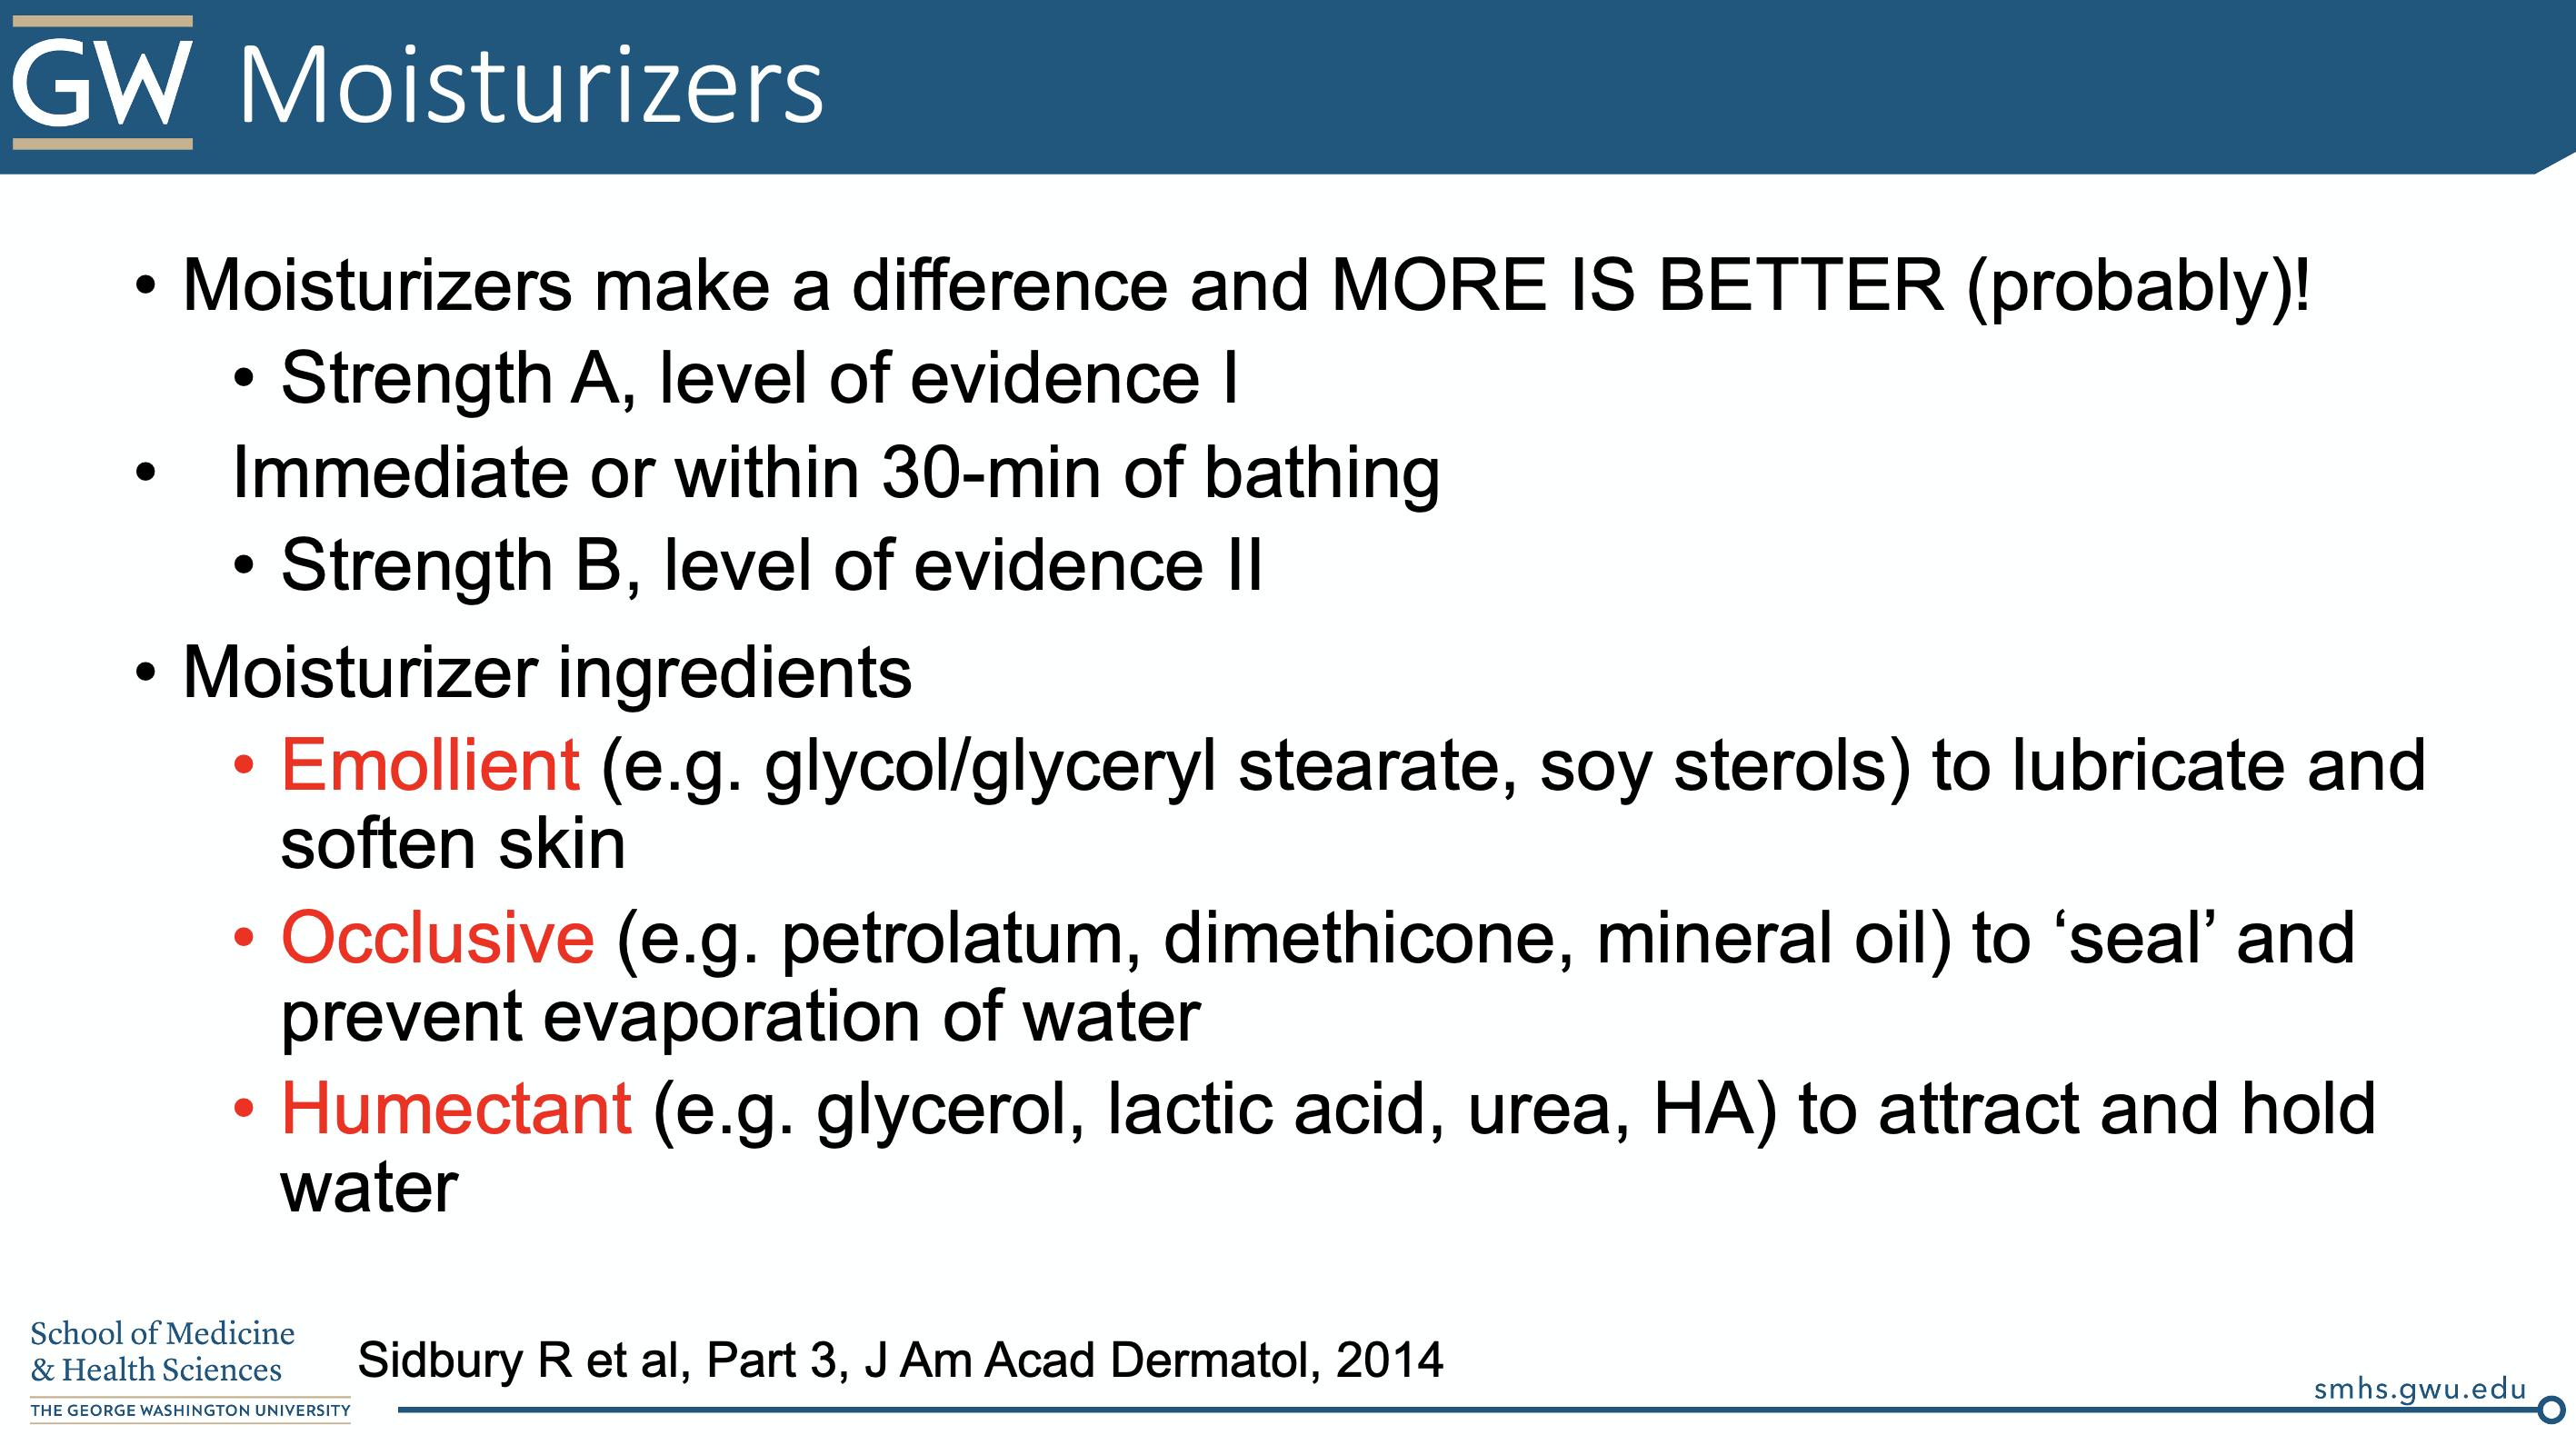 Moisturizers for atopic dermatitis